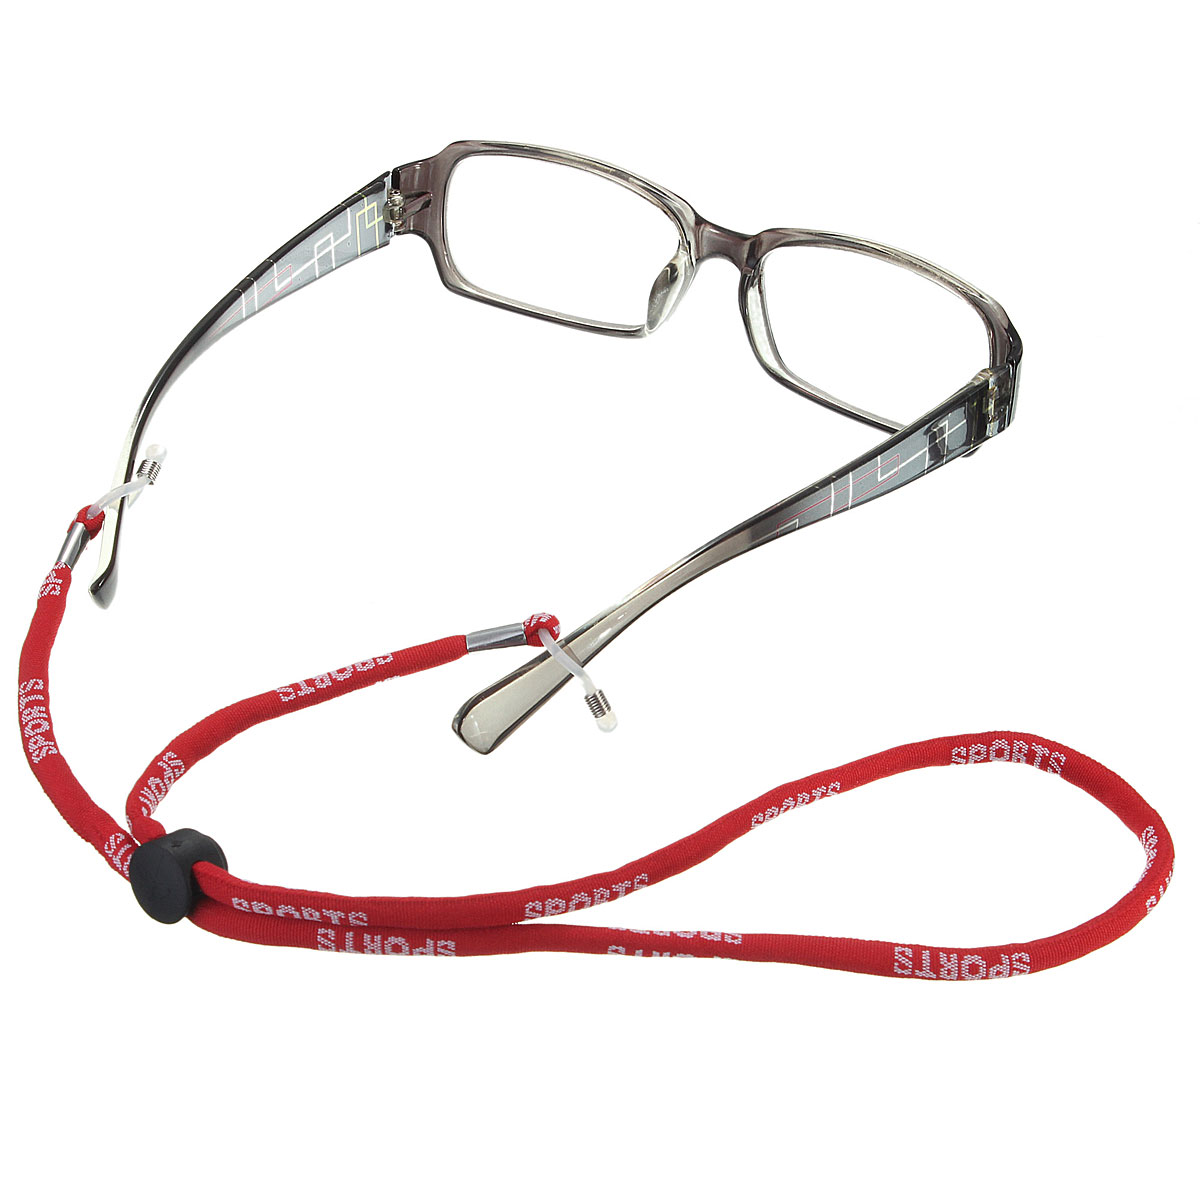 cordelette lunettes cha ne chainette cordons support. Black Bedroom Furniture Sets. Home Design Ideas